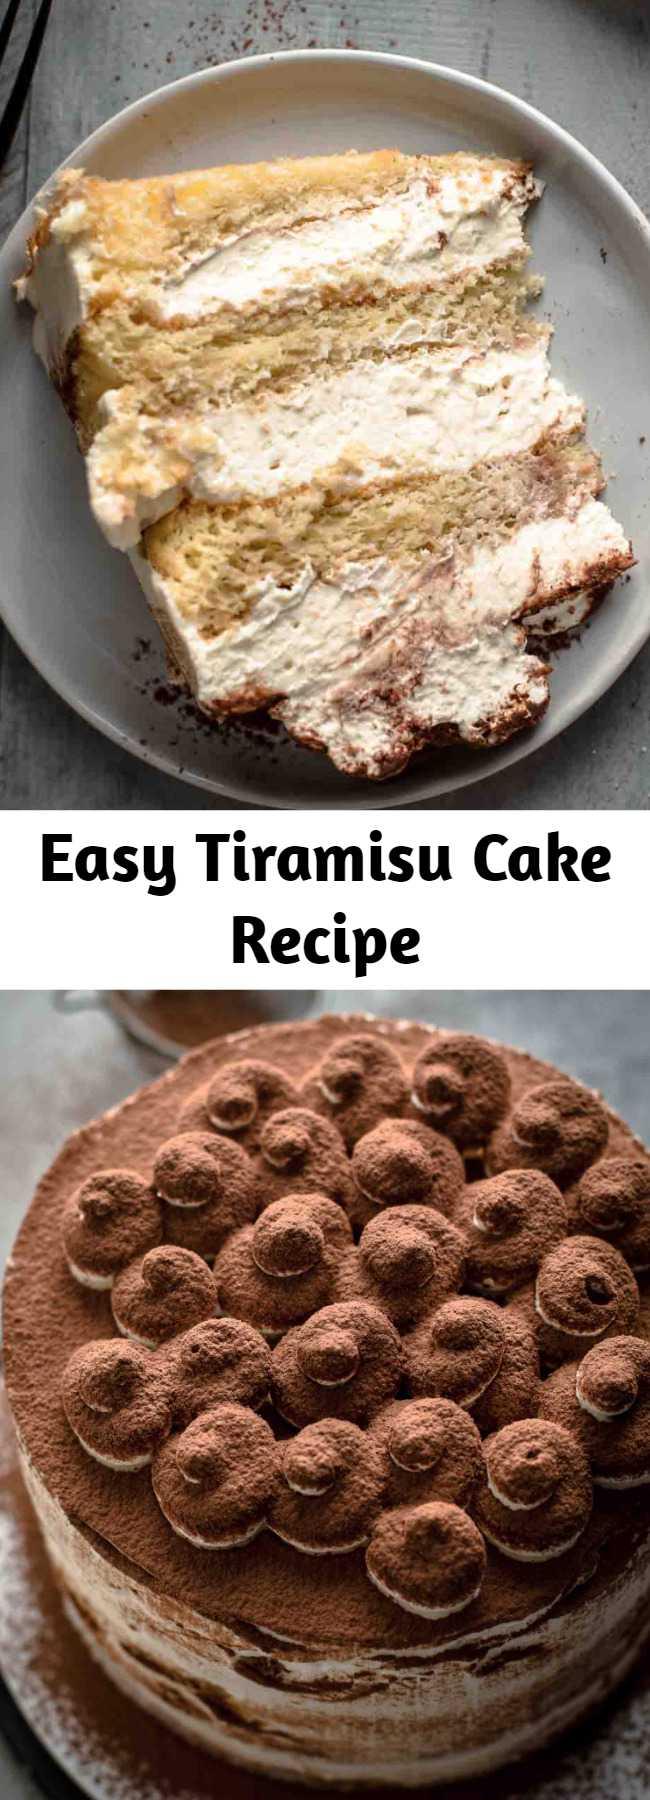 Easy Tiramisu Cake Recipe - If you want to have Tiramisu and cake at the same time, then this Tiramisu Cake is the solution. 5 ingredient genoise cake brushed with strong espresso and filled with irresistibly creamy coffee mascarpone cream. No raw eggs in the frosting. Just 10 ingredients! #tiramisu #tiramisucake #cake #italiandessert #dessert #baking #tiramisucakerecipe